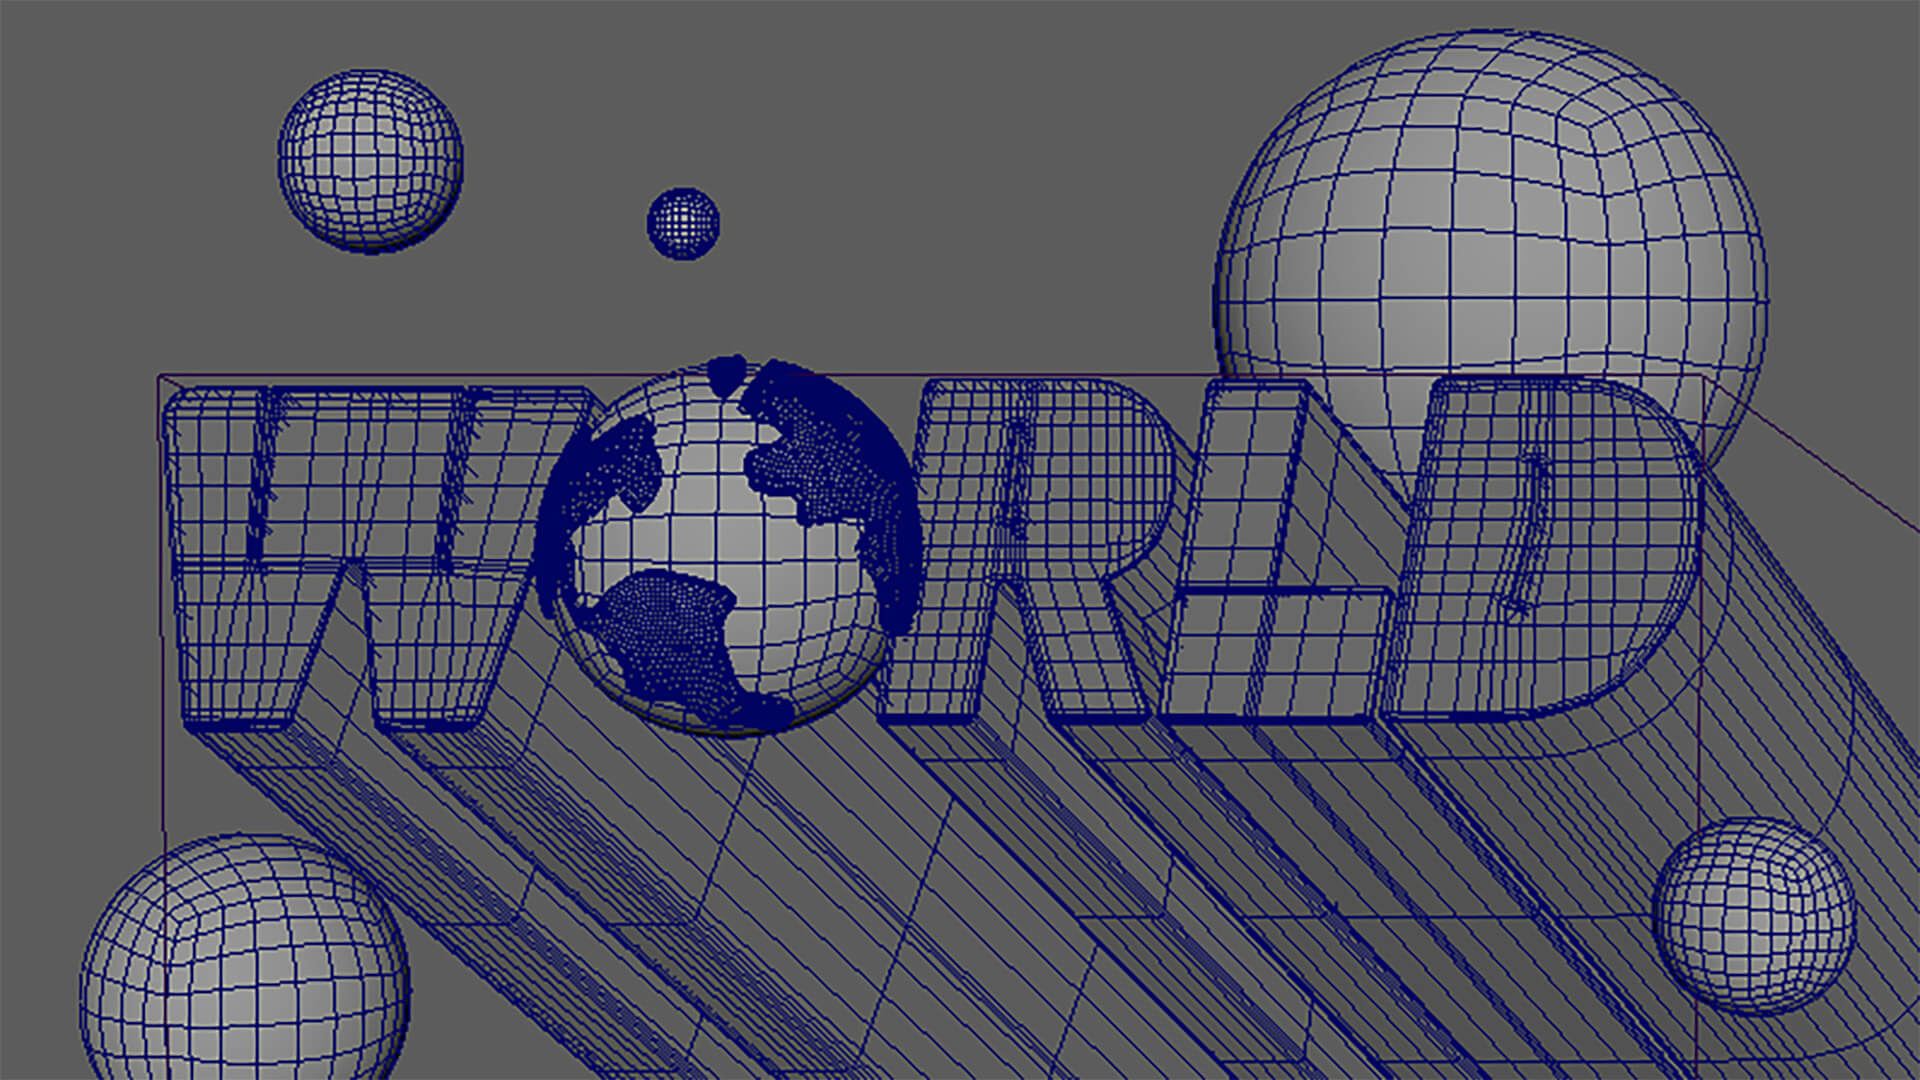 roofstudio_juni-learning_world-02-7